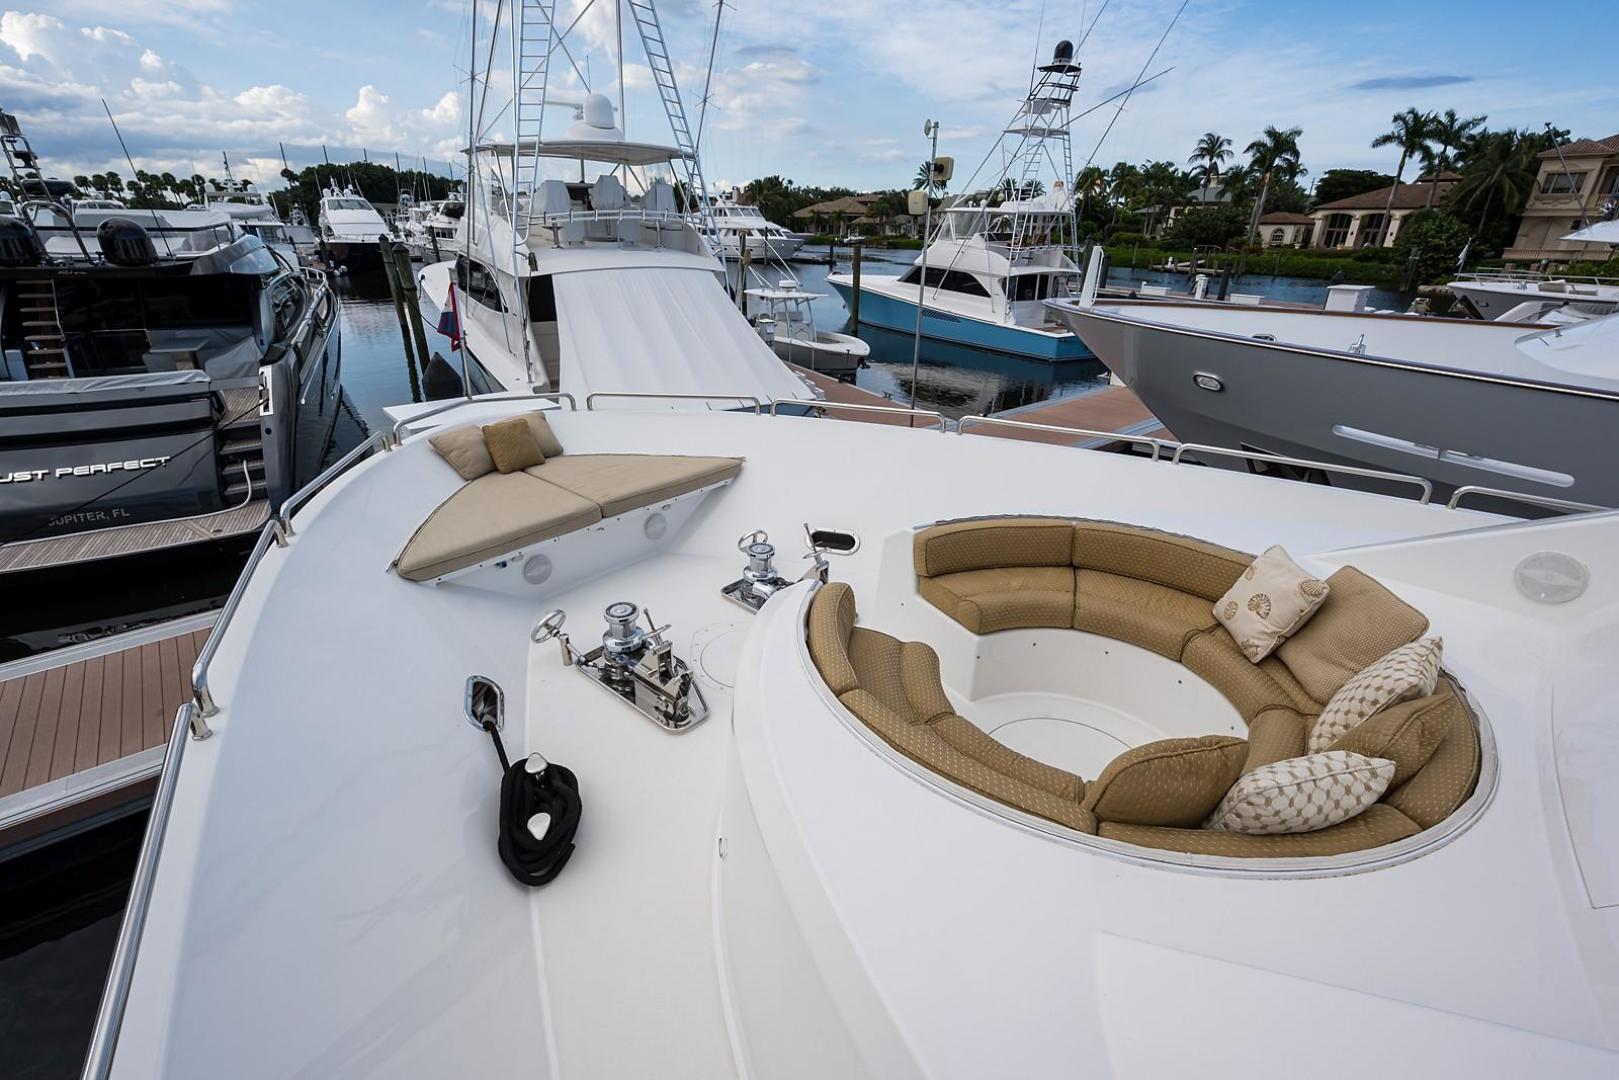 Westport-Motoryacht 2010-Cavallino Fort Lauderdale-Florida-United States-Bow-1270110 | Thumbnail